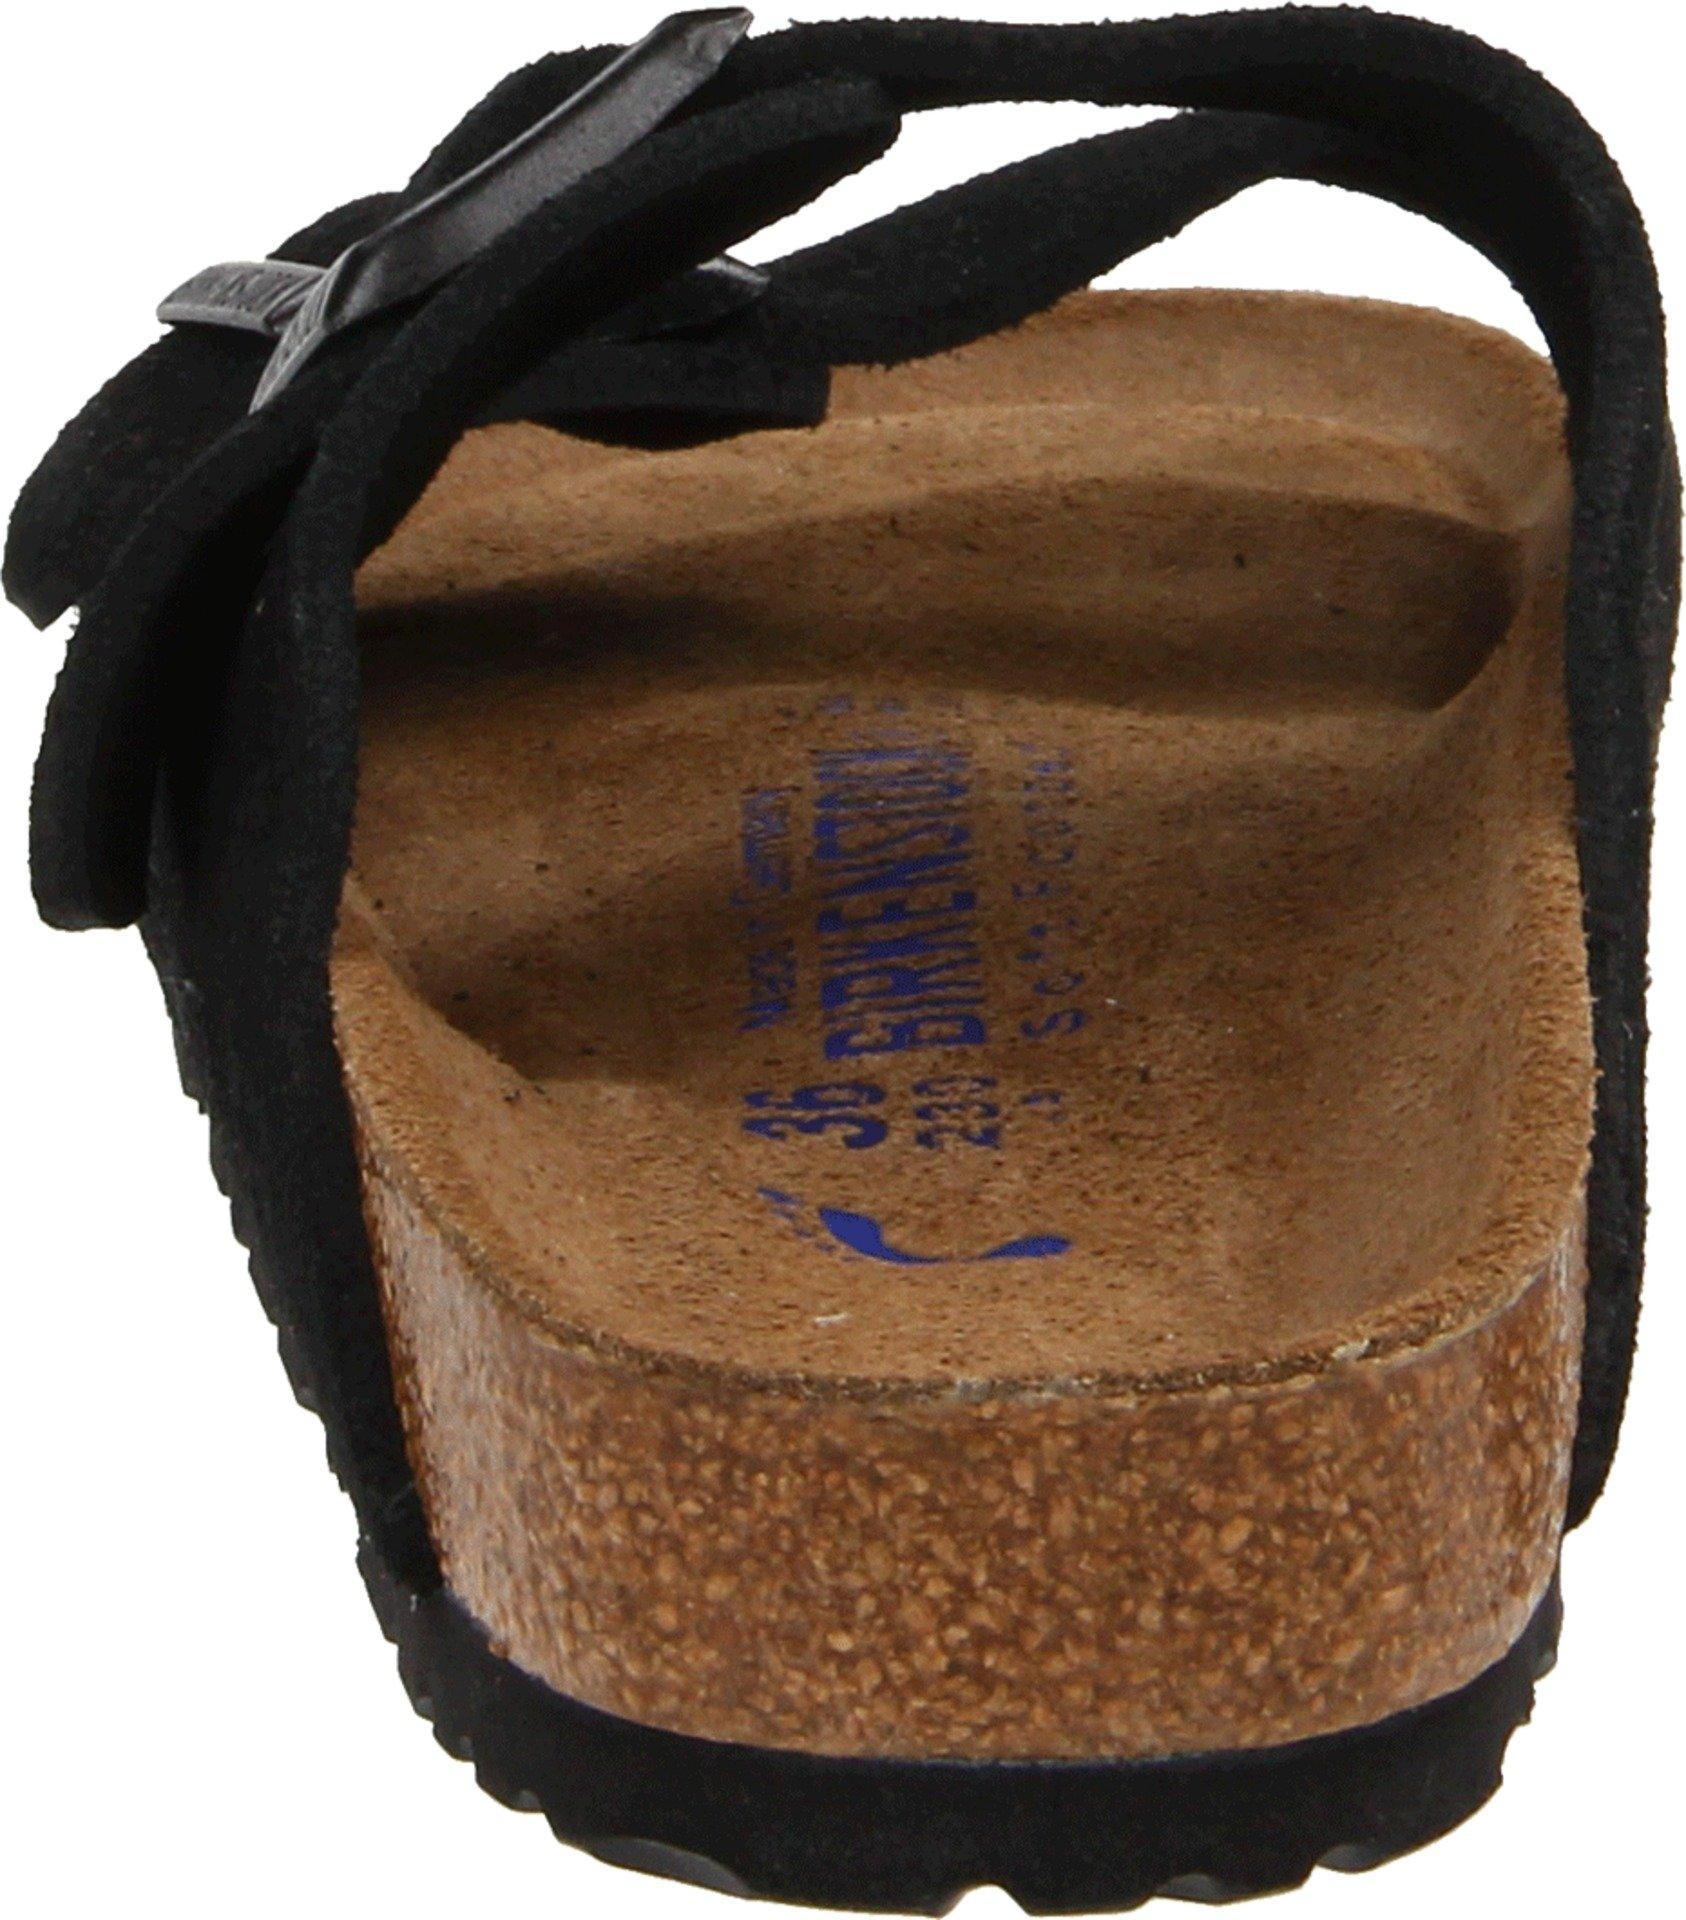 Birkenstock Arizona Soft Footbed Black Suede Regular Width - EU Size 35 / Women's US Sizes 4-4.5 by Birkenstock (Image #2)